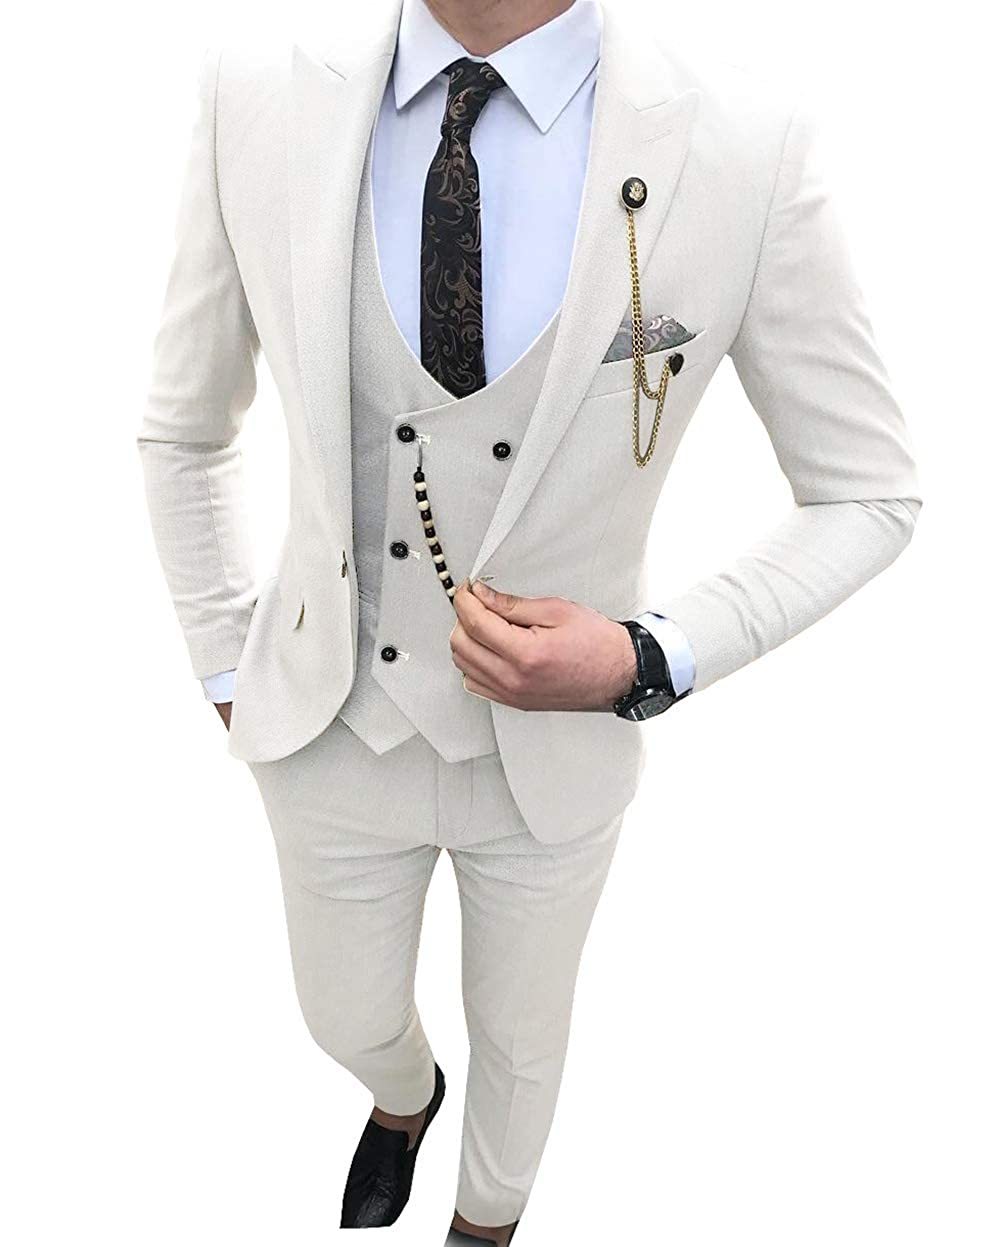 Blazer+Vest+Pants Aesido Fashion Mens Suits Slim Fit 3 Pieces Prom Tuxedos Notch Lapel Groomsmen Wedding